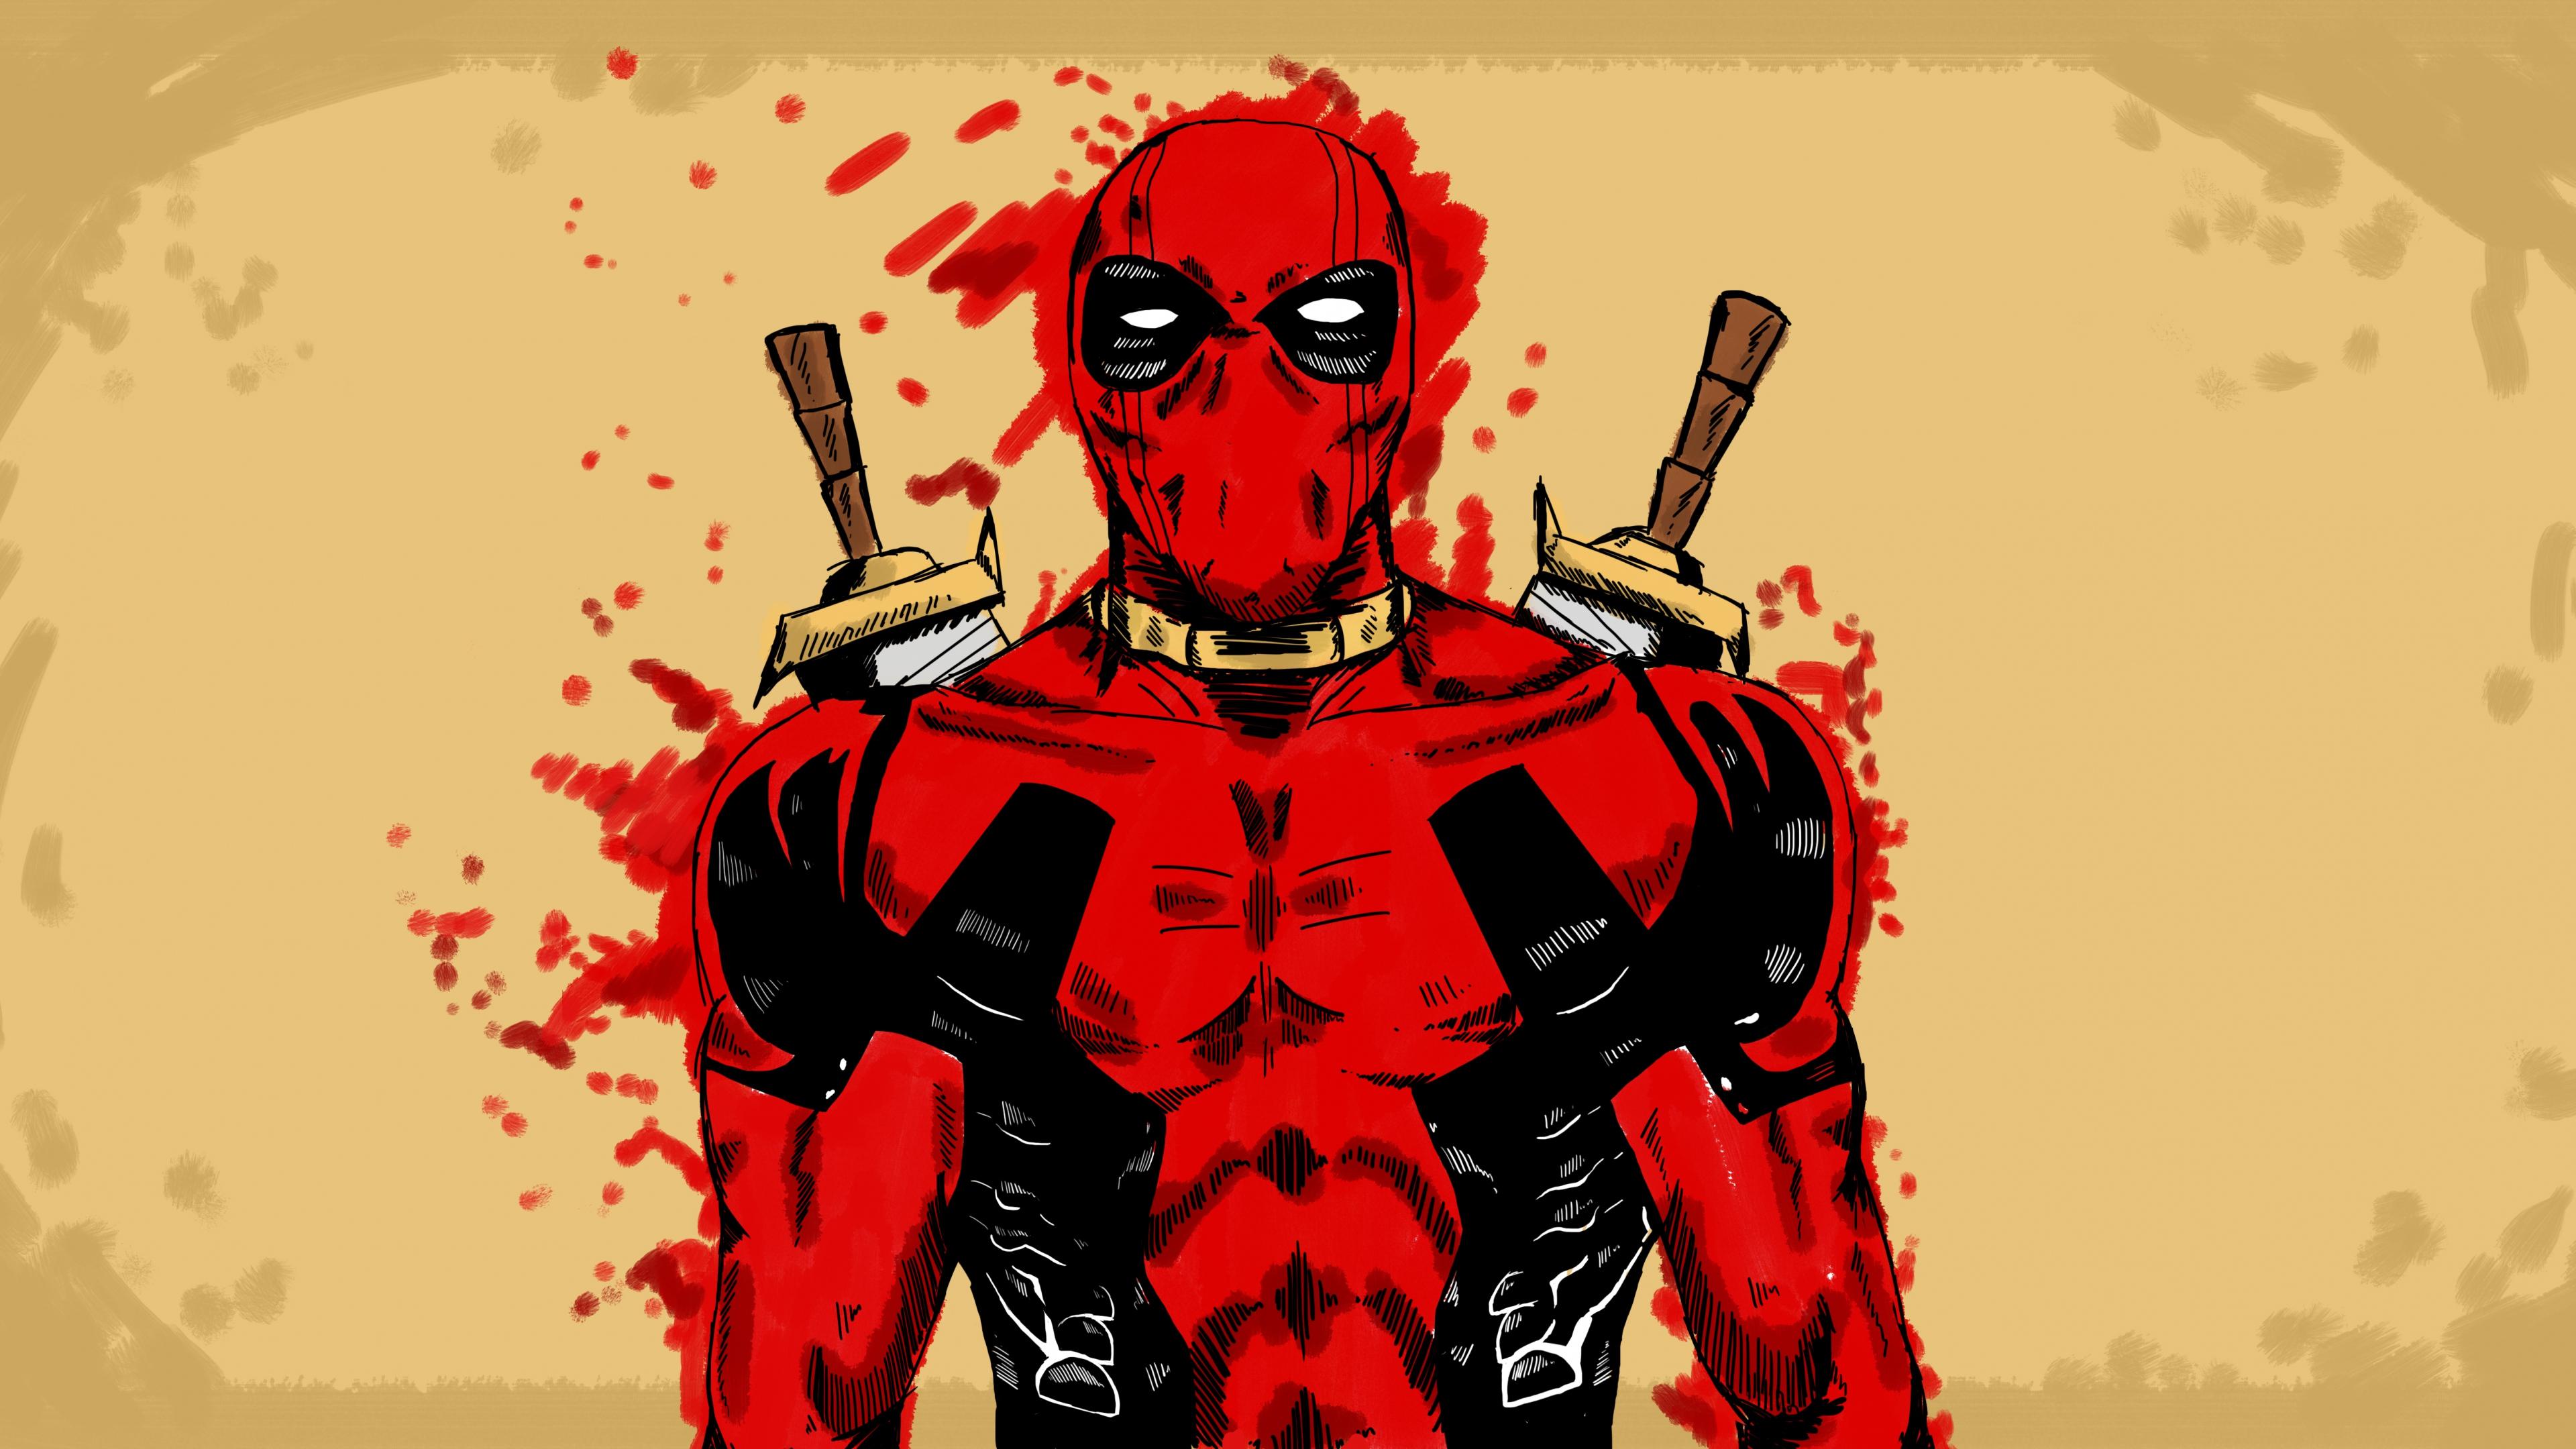 deadpool marvel comic art 1540748183 - Deadpool Marvel Comic Art - movies wallpapers, marvel comics wallpapers, deadpool wallpapers, artist wallpapers